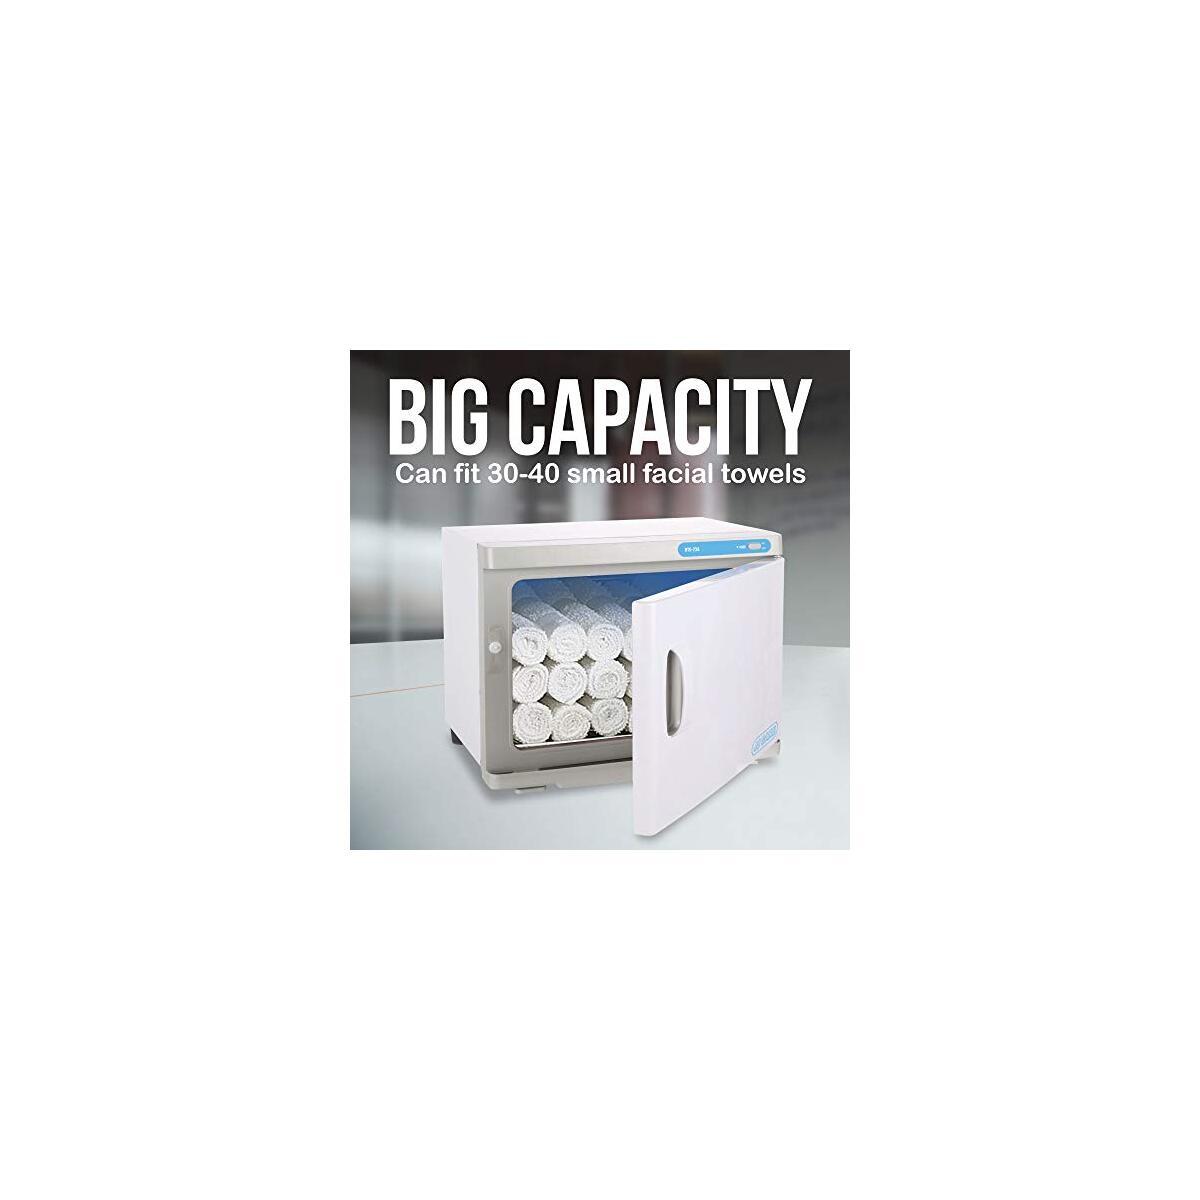 JJ CARE UV Towel Warmer, Hot Towel Cabinet, UV Towel Sterilizer 23L, Spa Hot Towel Warmer with UV Sterilizer, 30-40 Small Facial Towels Capacity for Salon, Spa, Barber Shops